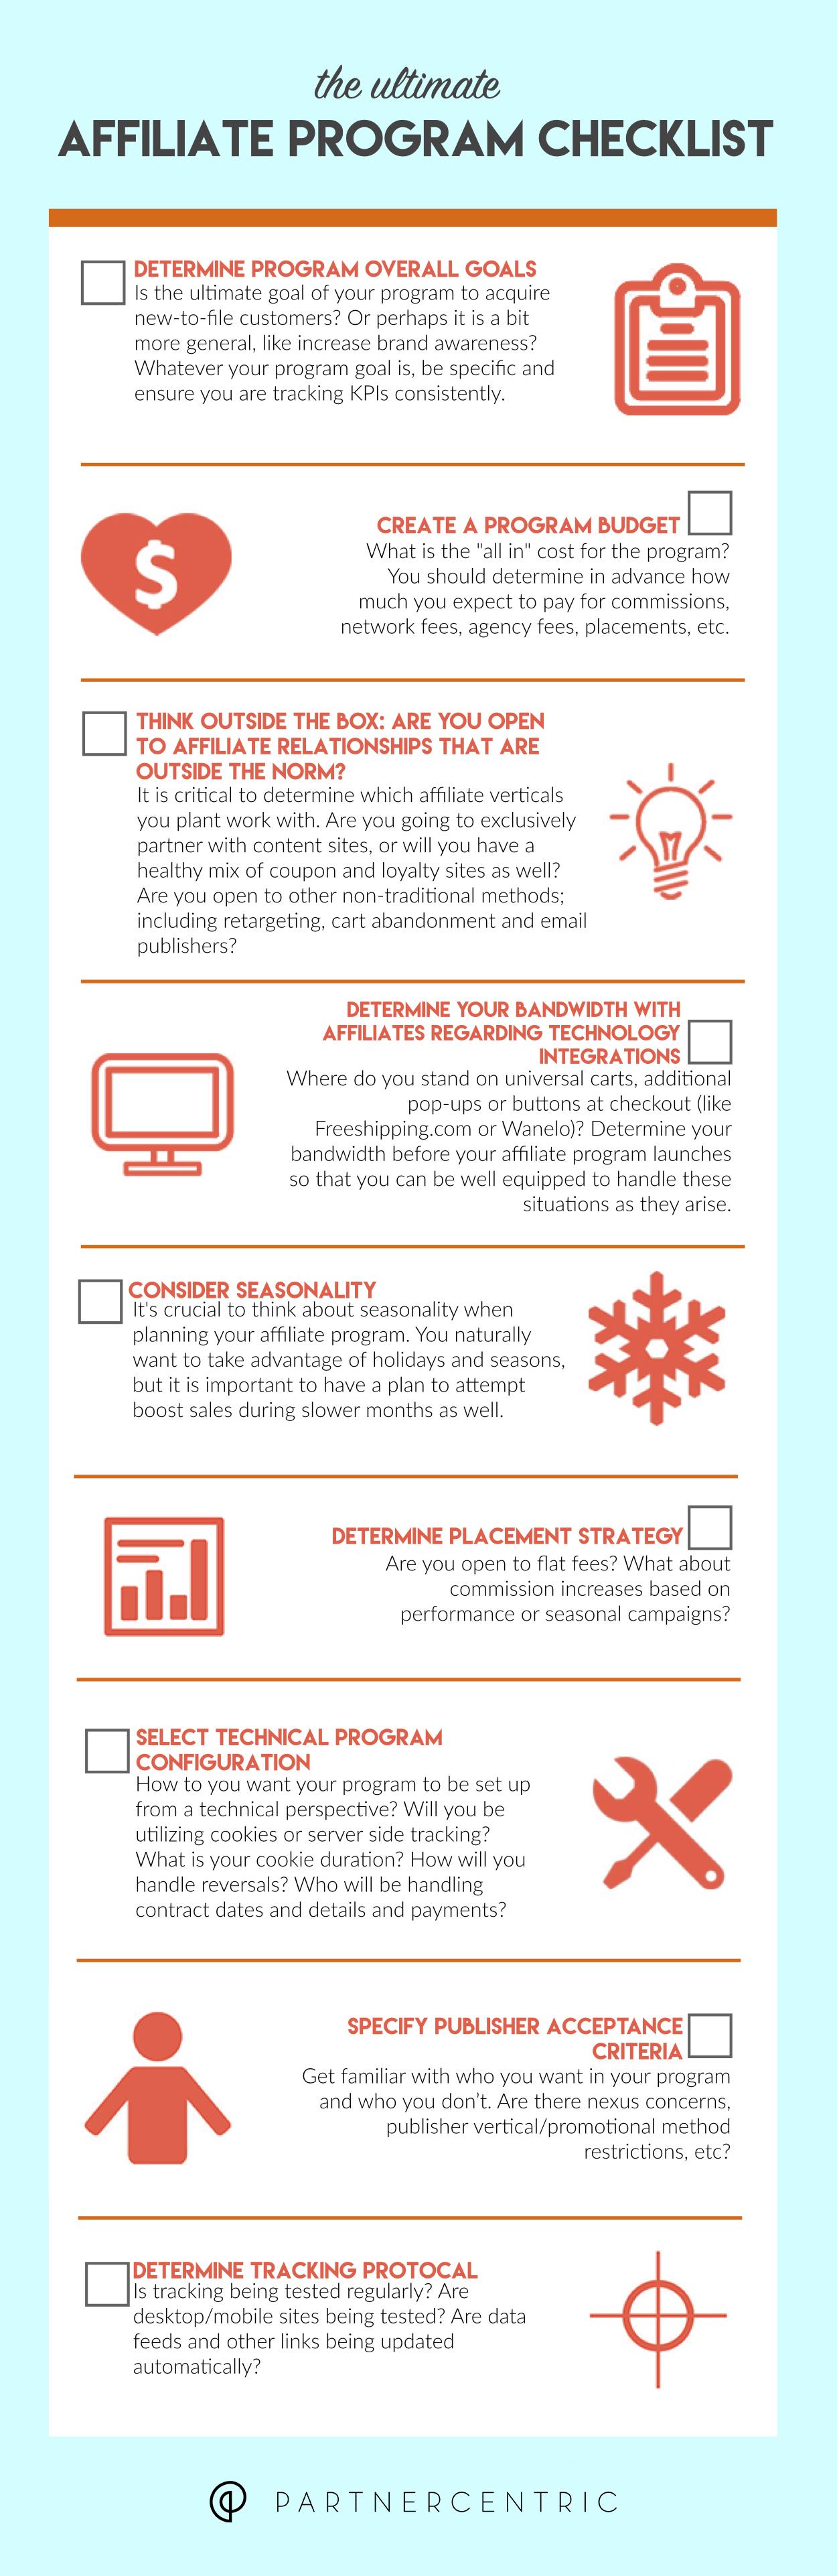 The Ultimate Affiliate Program Checklist